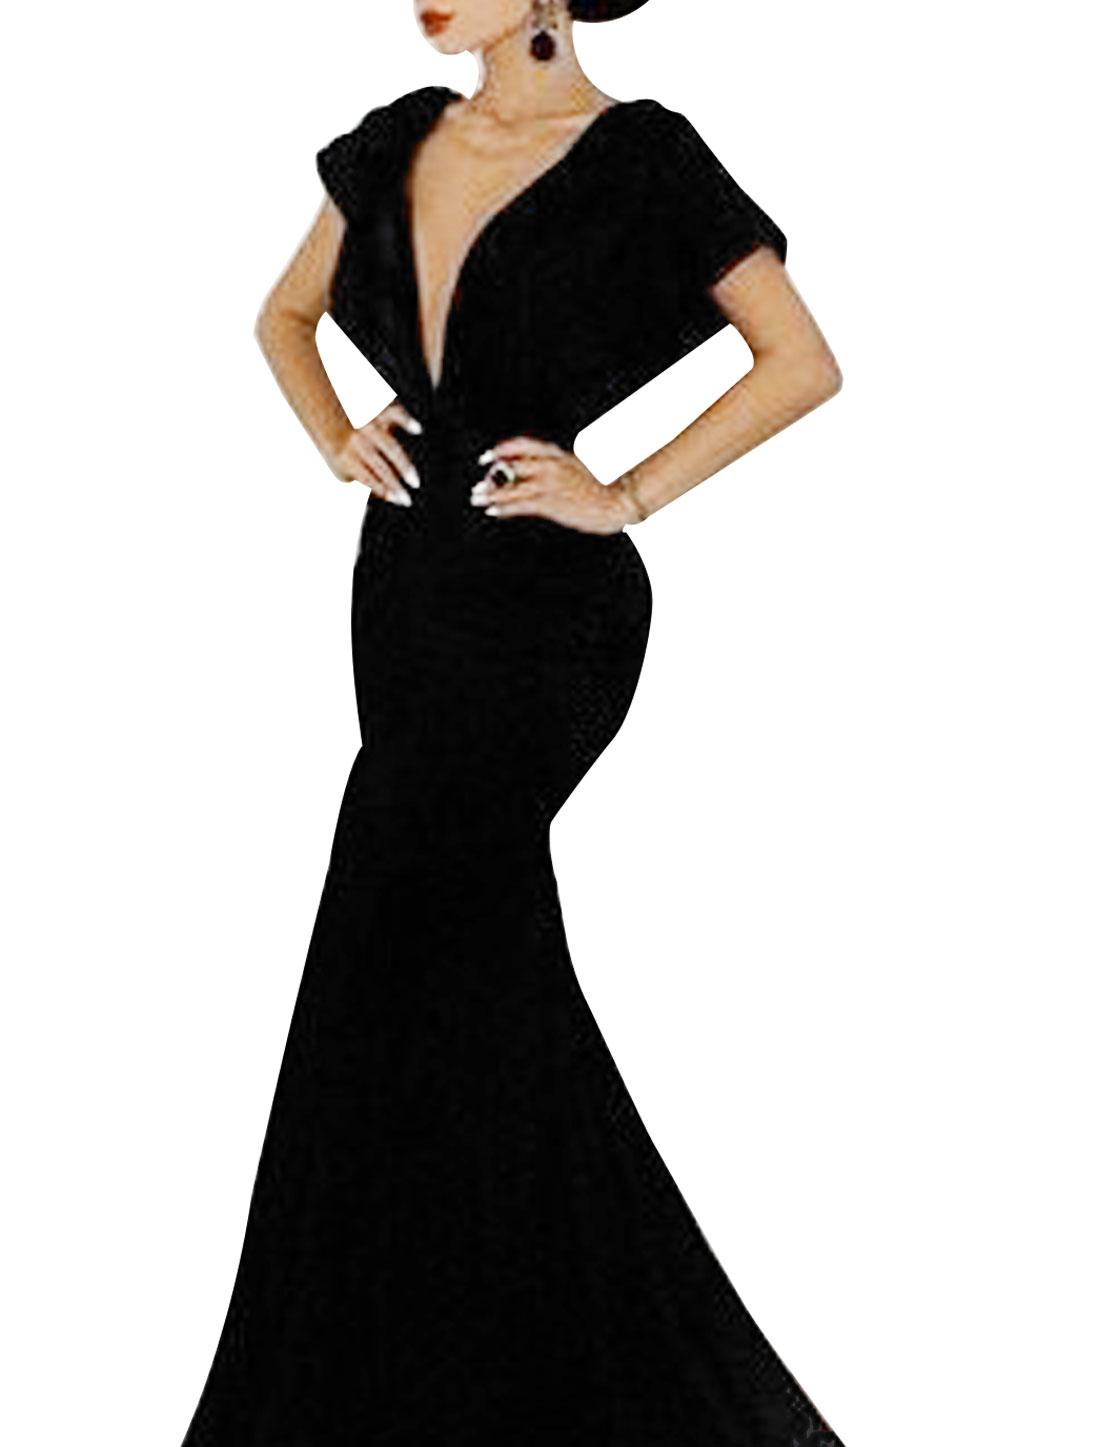 Lady Deep V Neck Batwing Sleeve Open Back Full-Length Mermaid Dress Black S